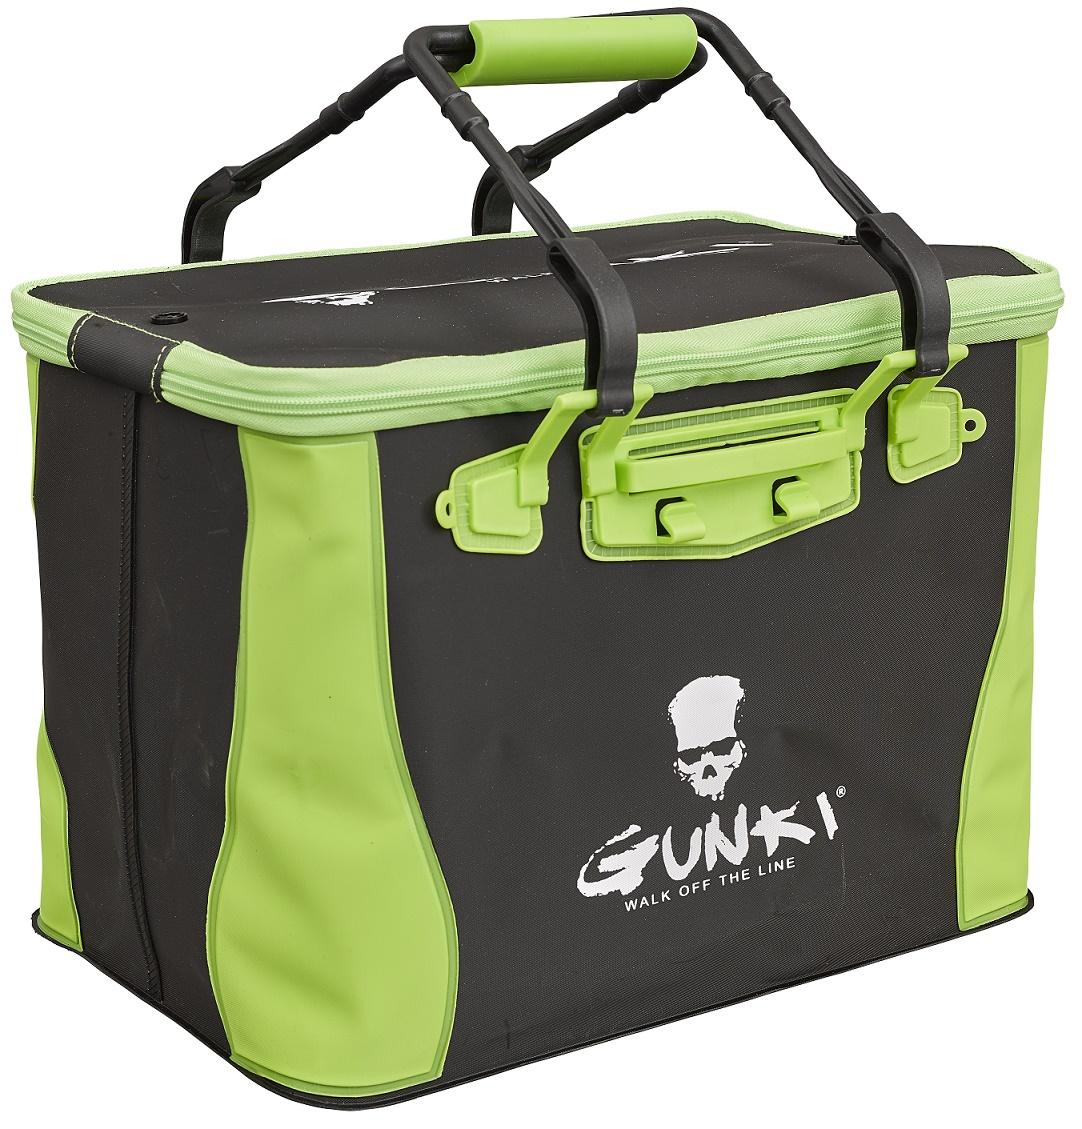 Nepromokavá taška Safe Bag Edge 40 Soft